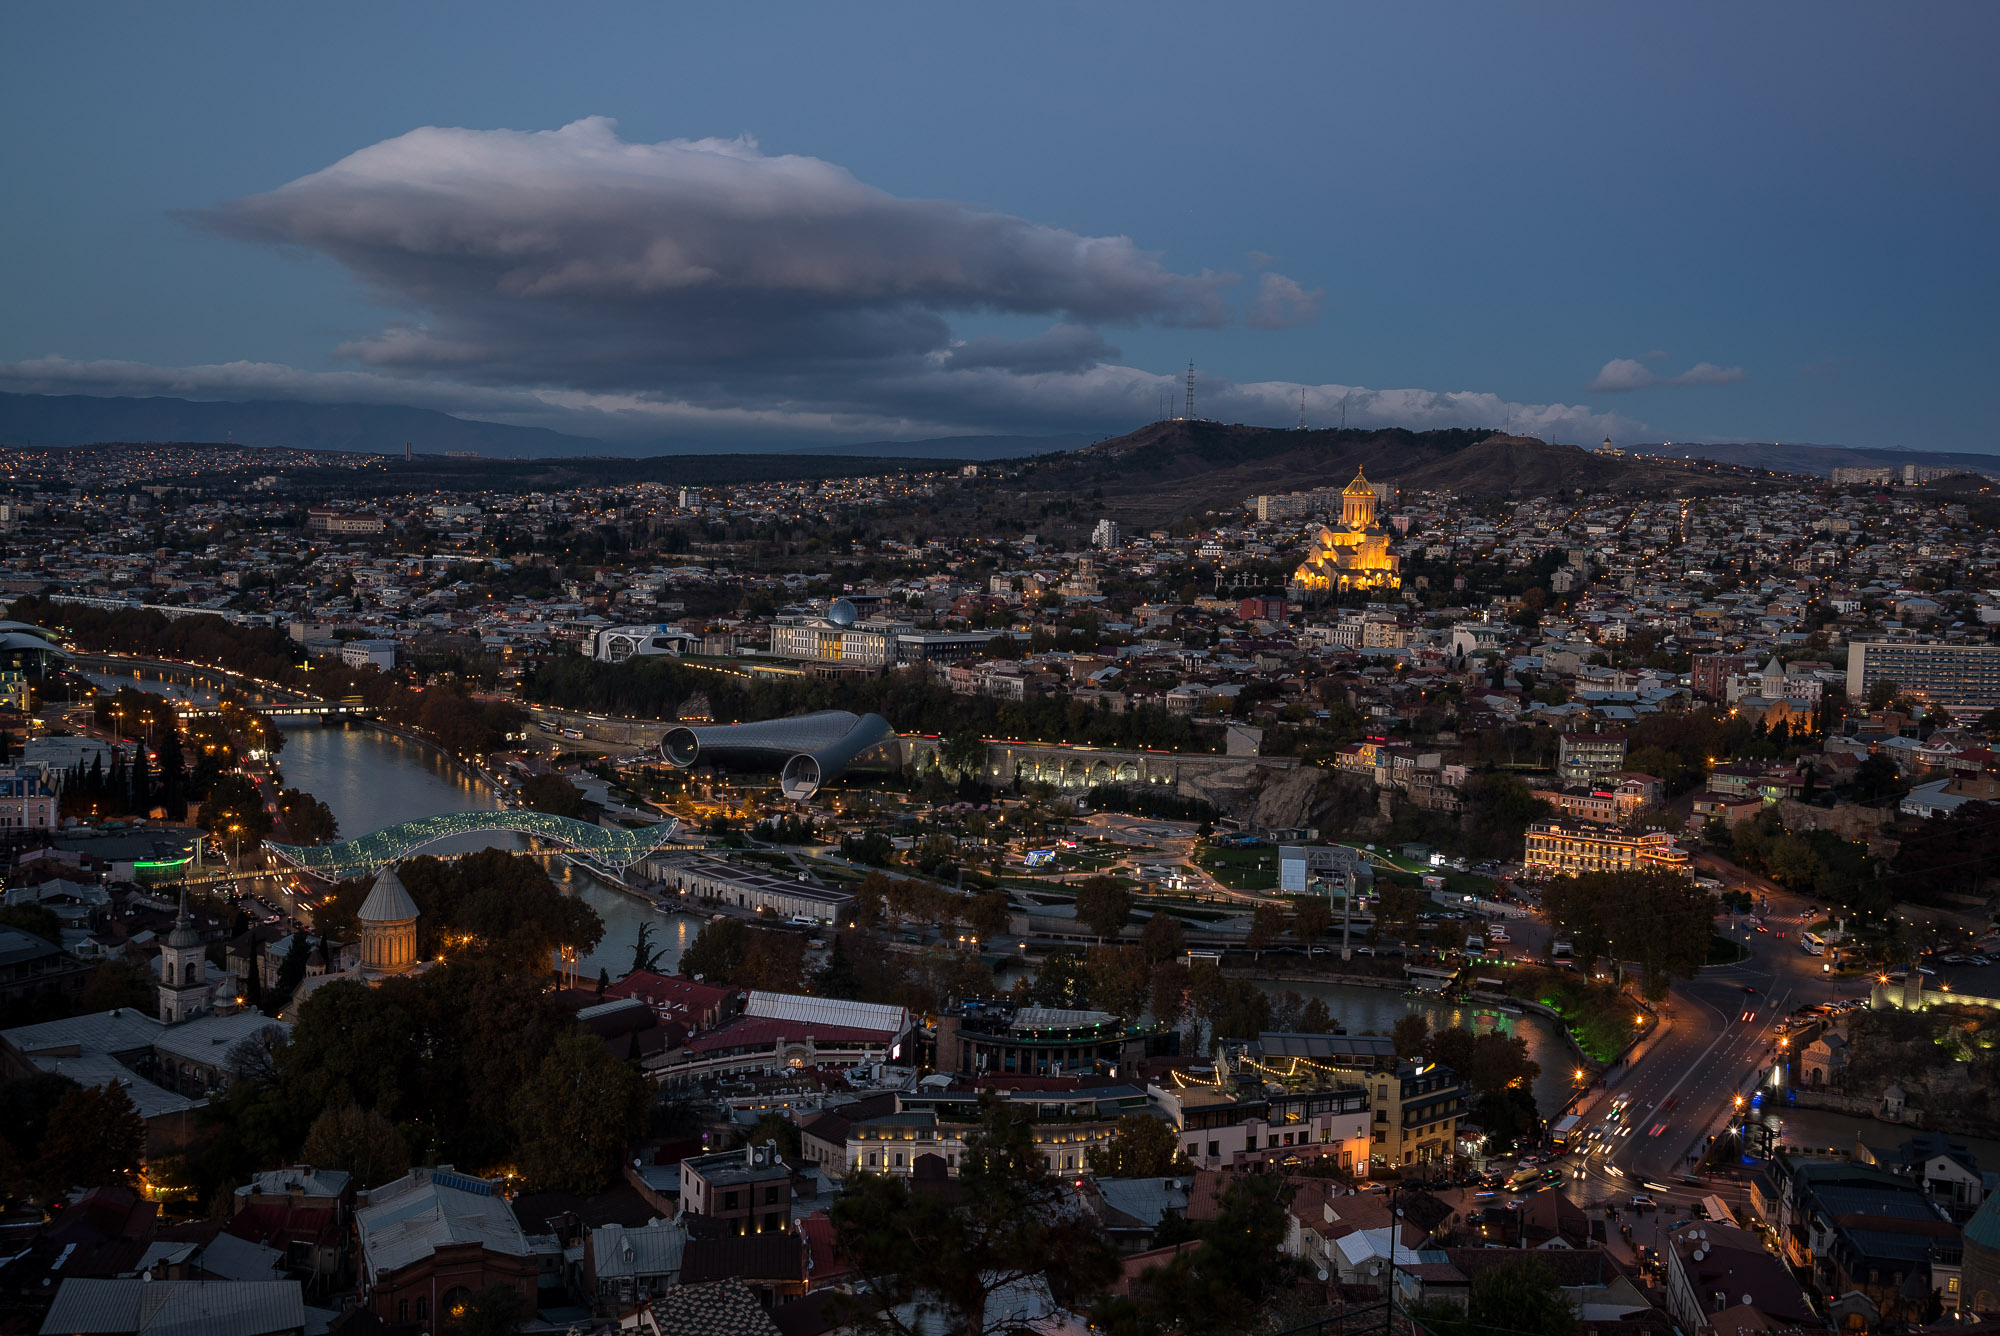 Tbilisi after nightfall